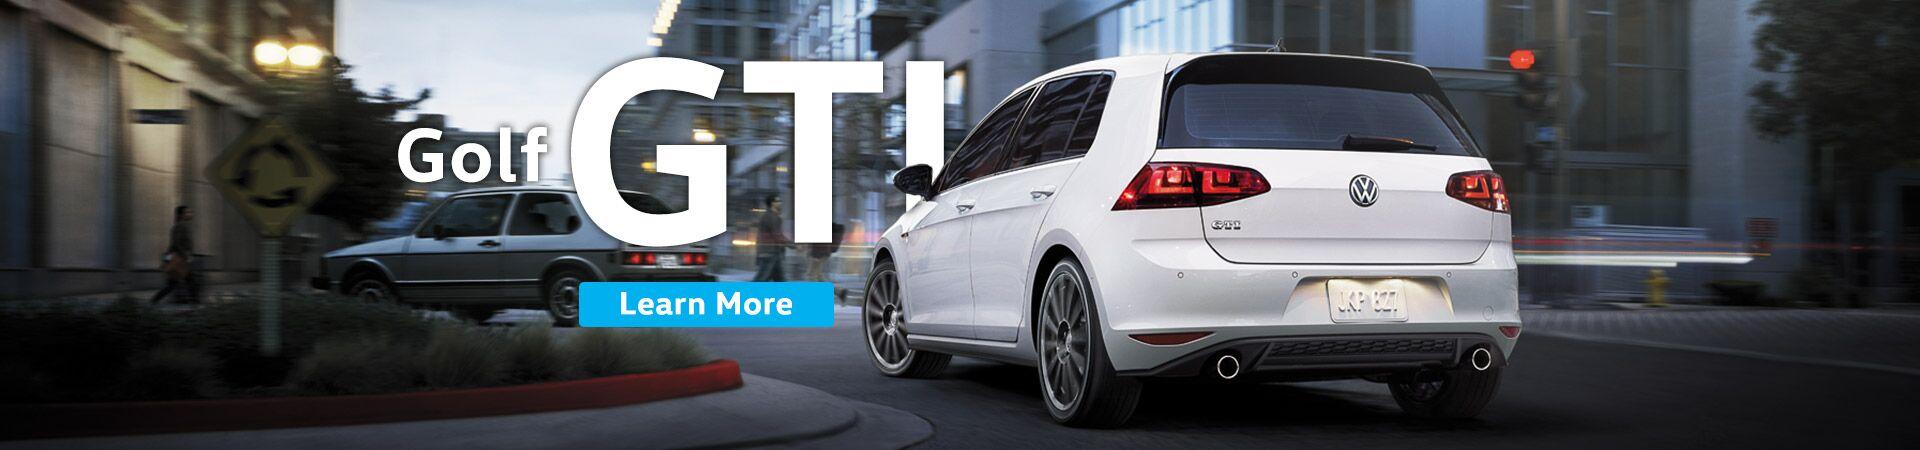 Volkswagen Dealership Lebanon MO, Ozark MO, Marshfield MO, Joplin MO Used Cars Napleton ...